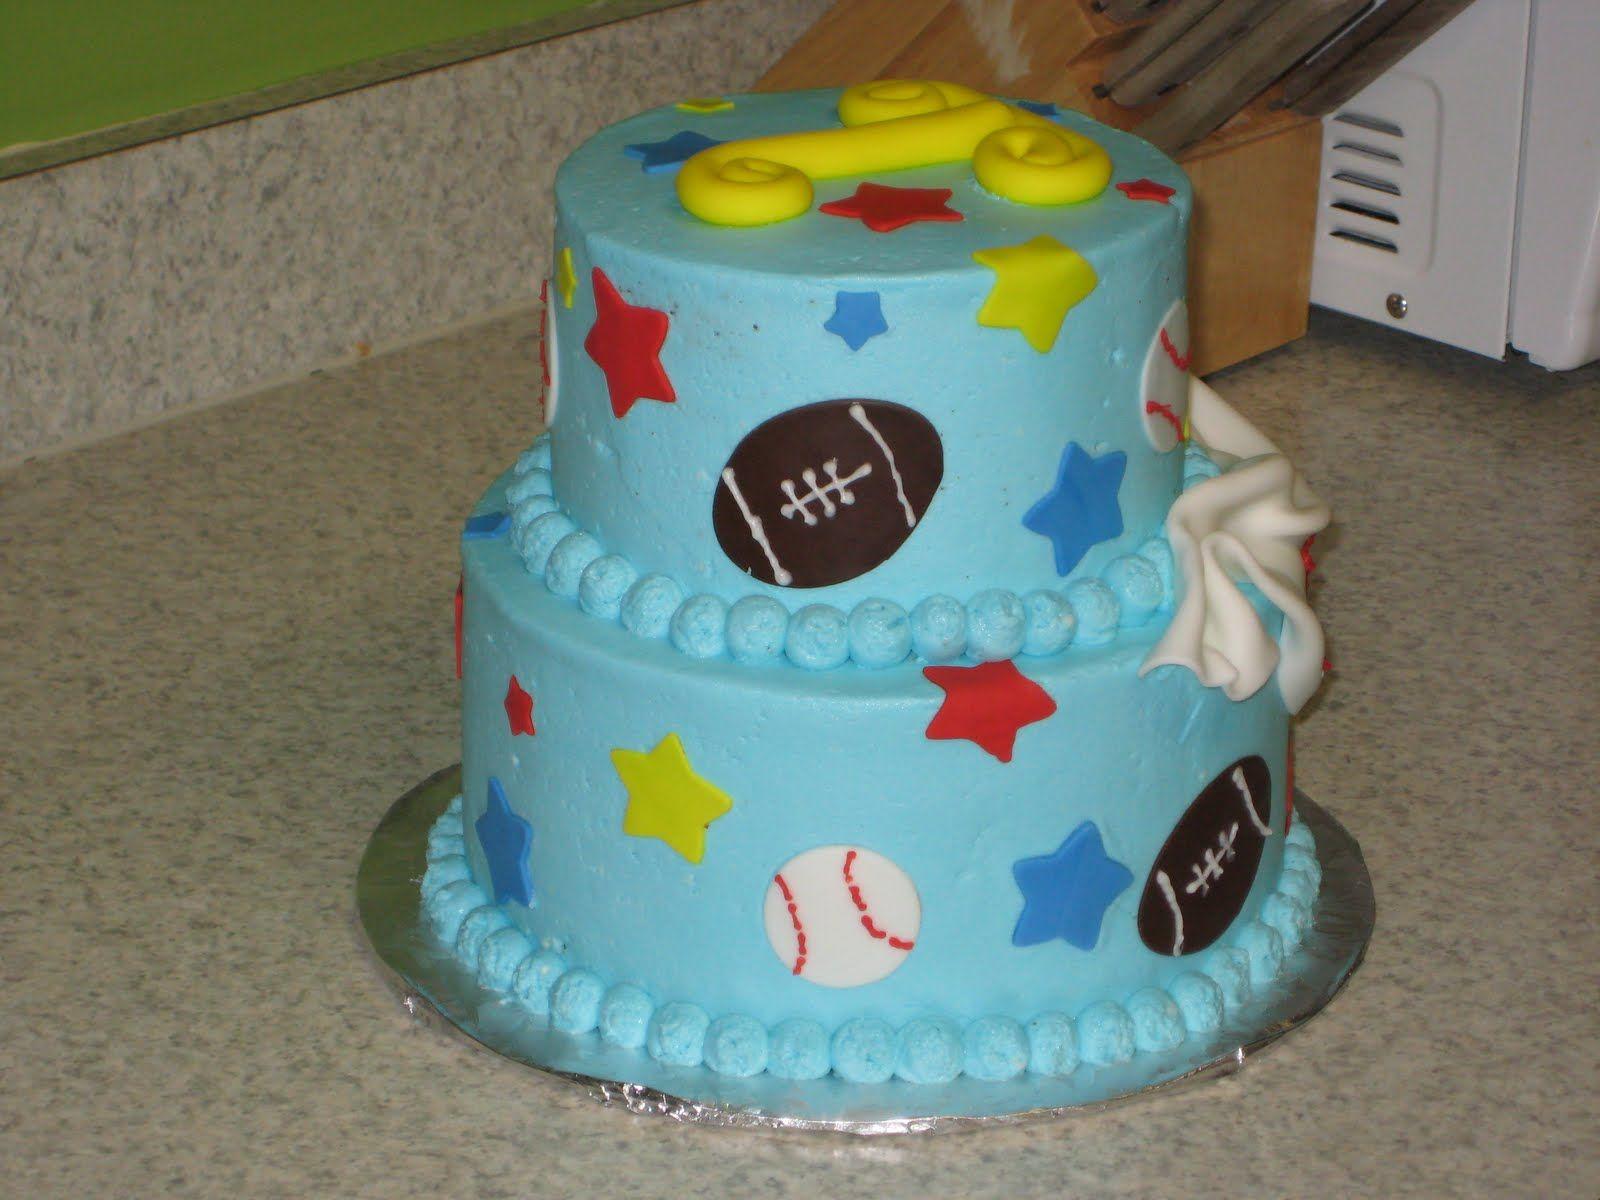 1st Birthday Party Cakes For Boys 1st Birthday Cakes for Boys